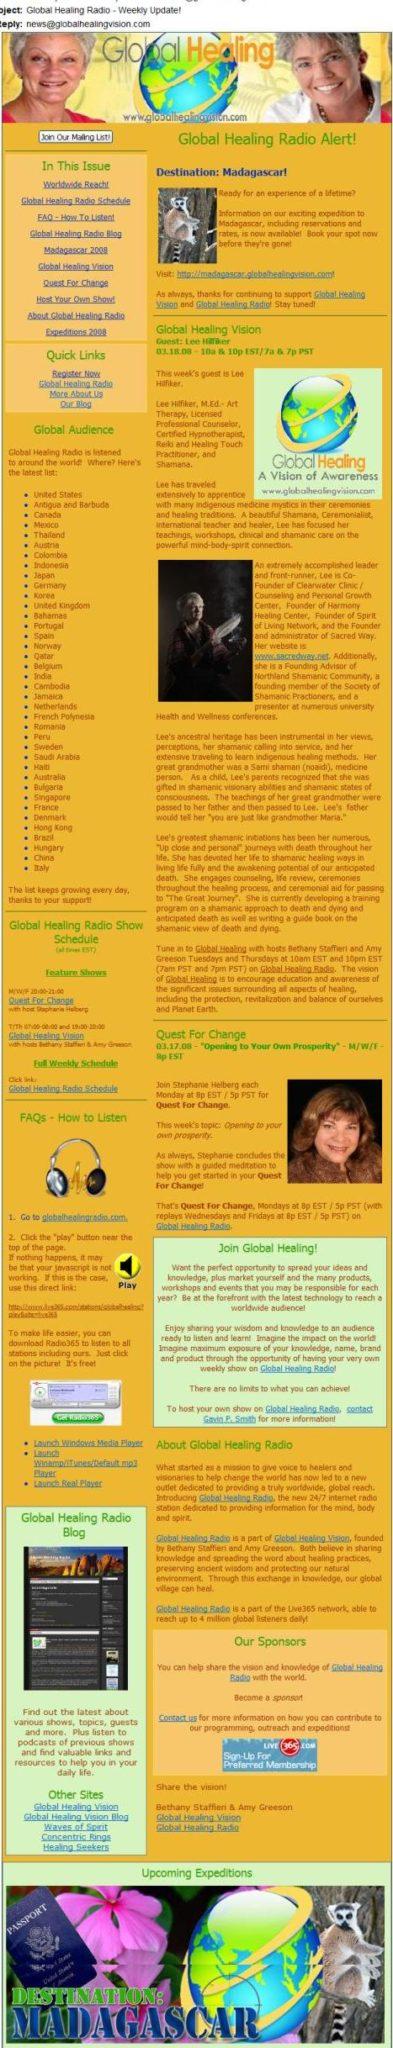 Global Healing Newsletter